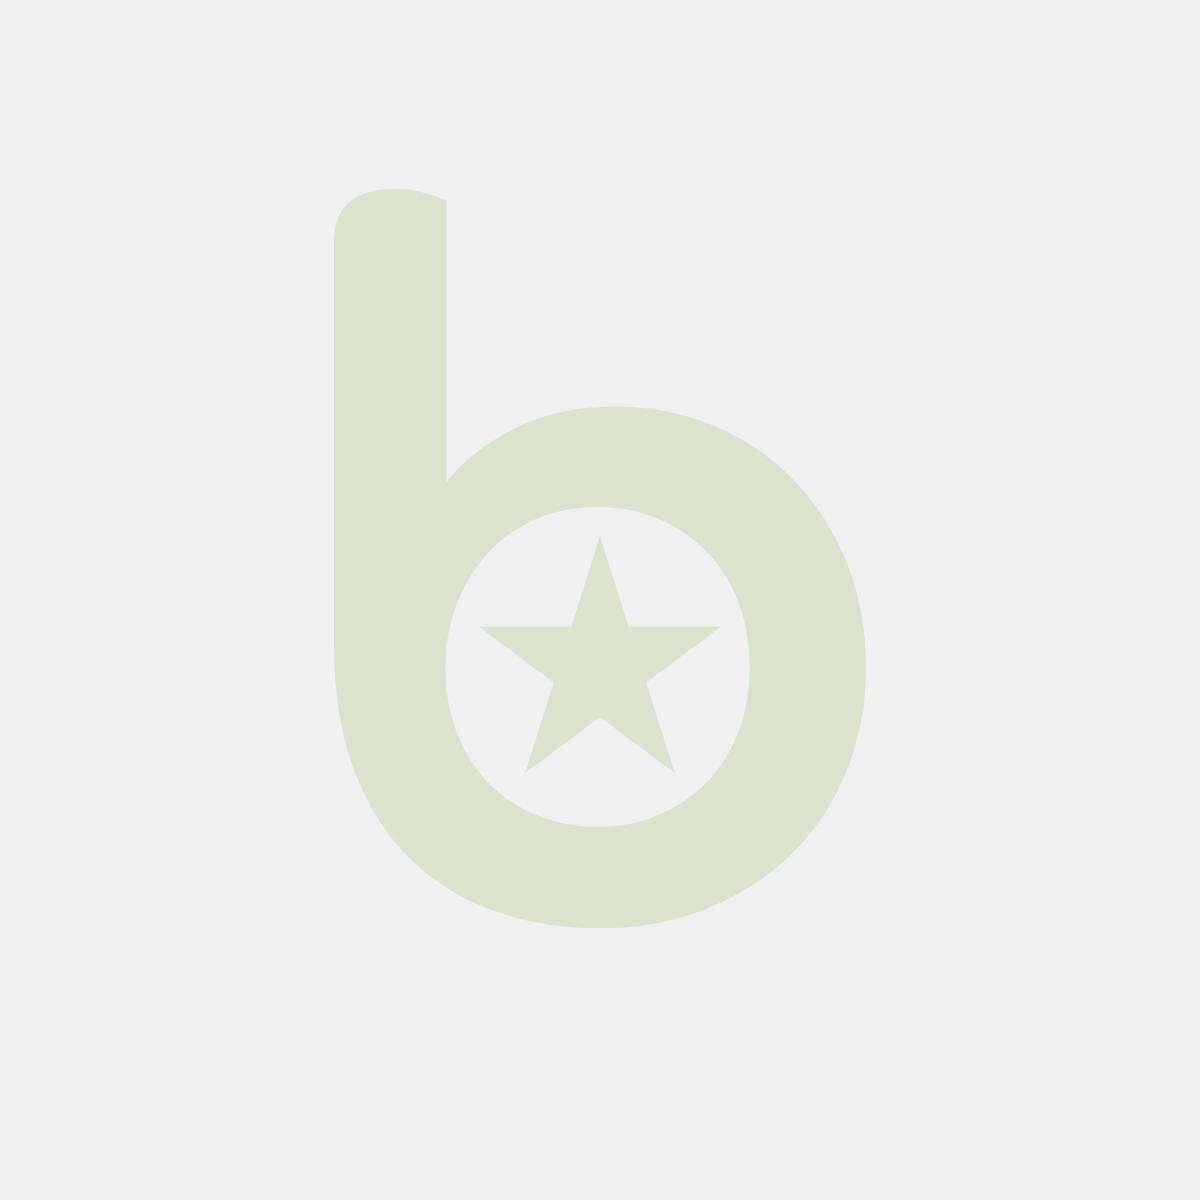 Nadstawa Chłodnicza Gn 1/4 5X Gn 1/4